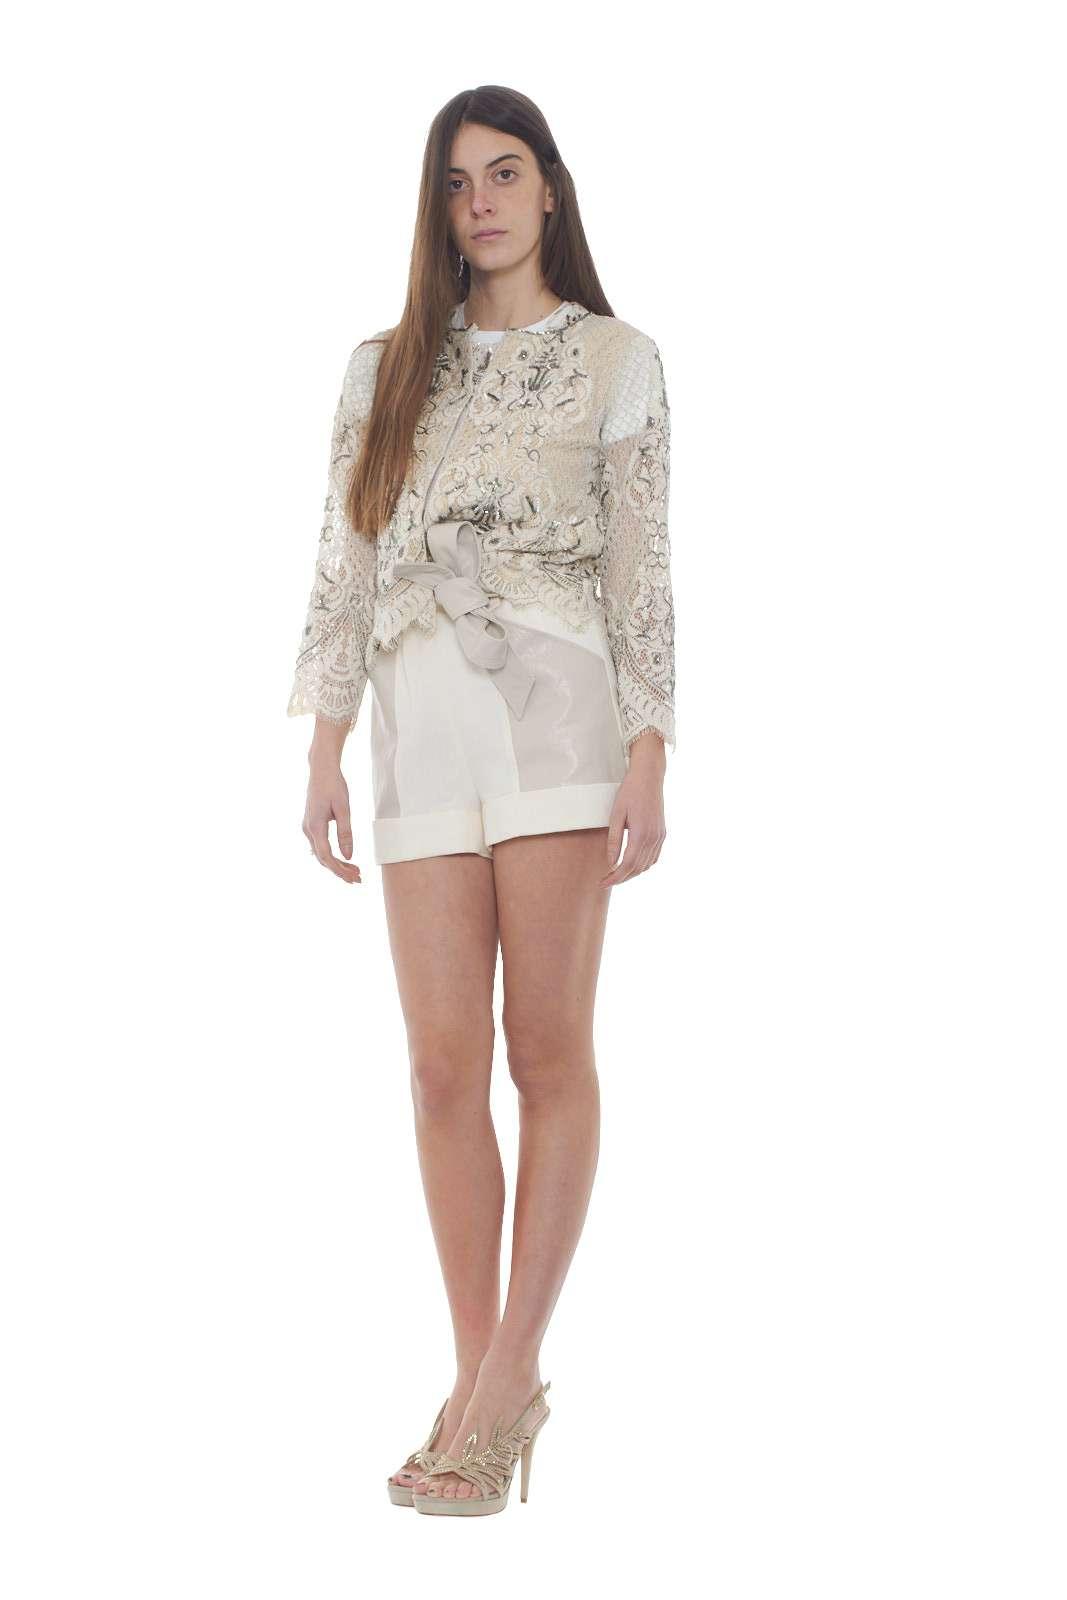 https://www.parmax.com/media/catalog/product/a/i/PE-outlet_parmax-t-shirt-donna-TwinSet-201TP246A-D.jpg